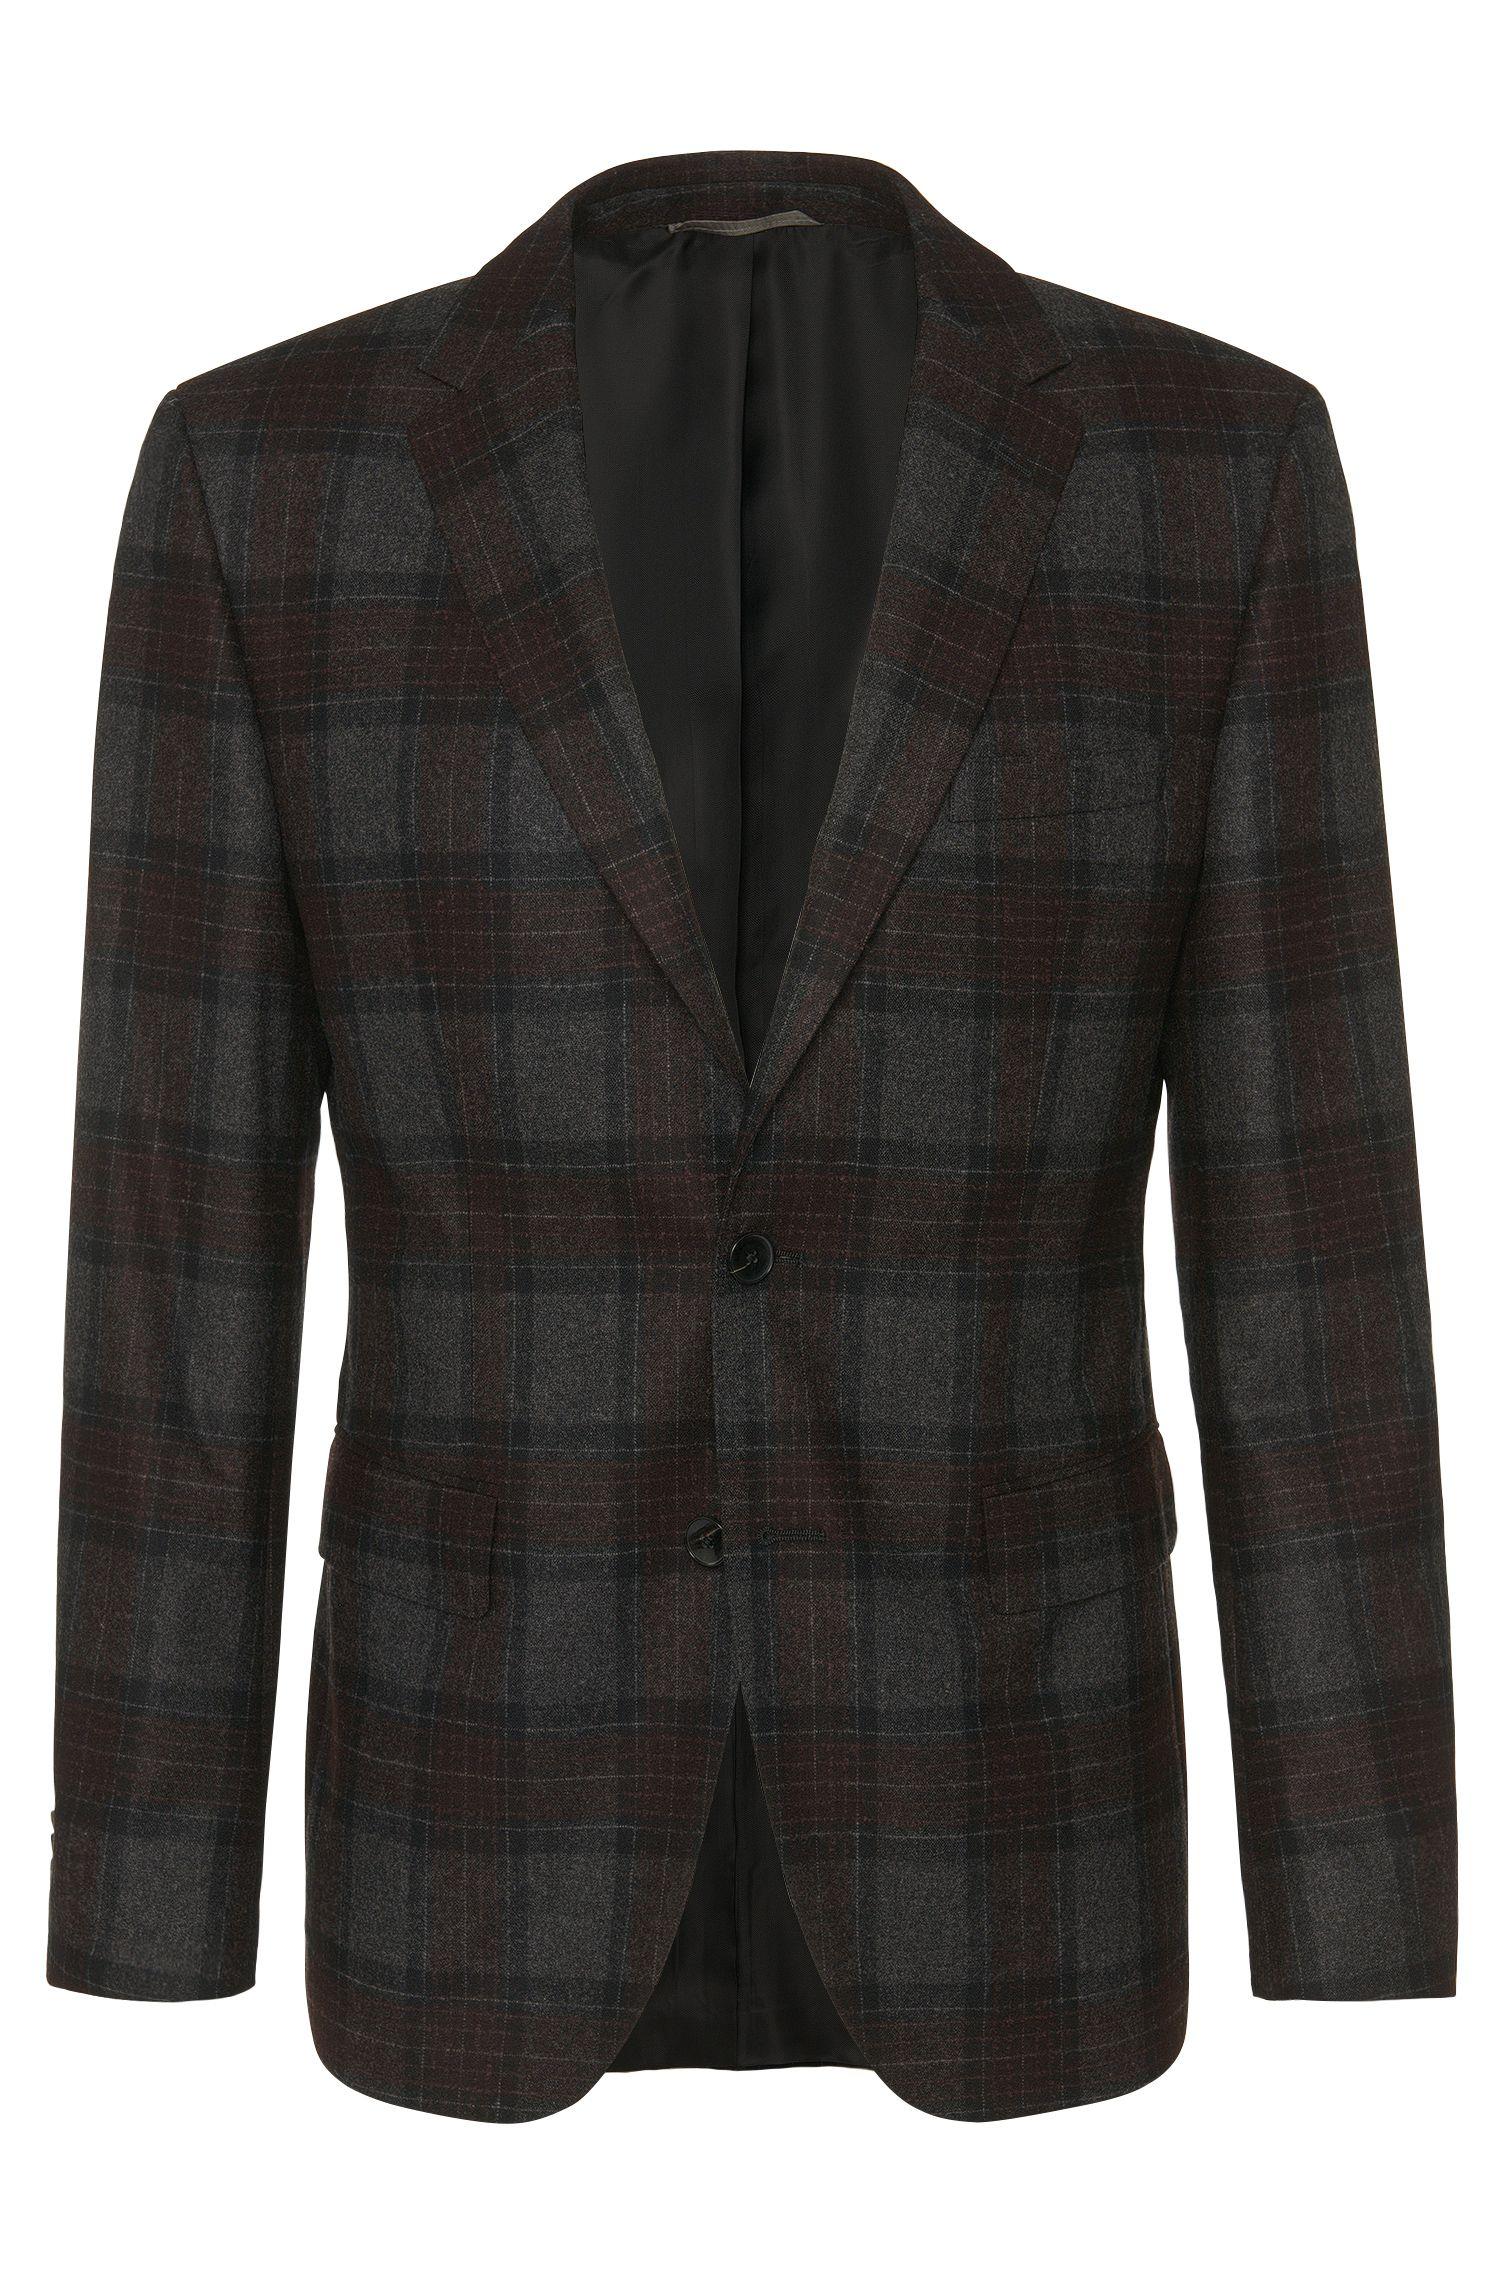 'Jeen' | Regular Fit, Italian Virgin Wool Cashmere Silk Blend Sport Coat